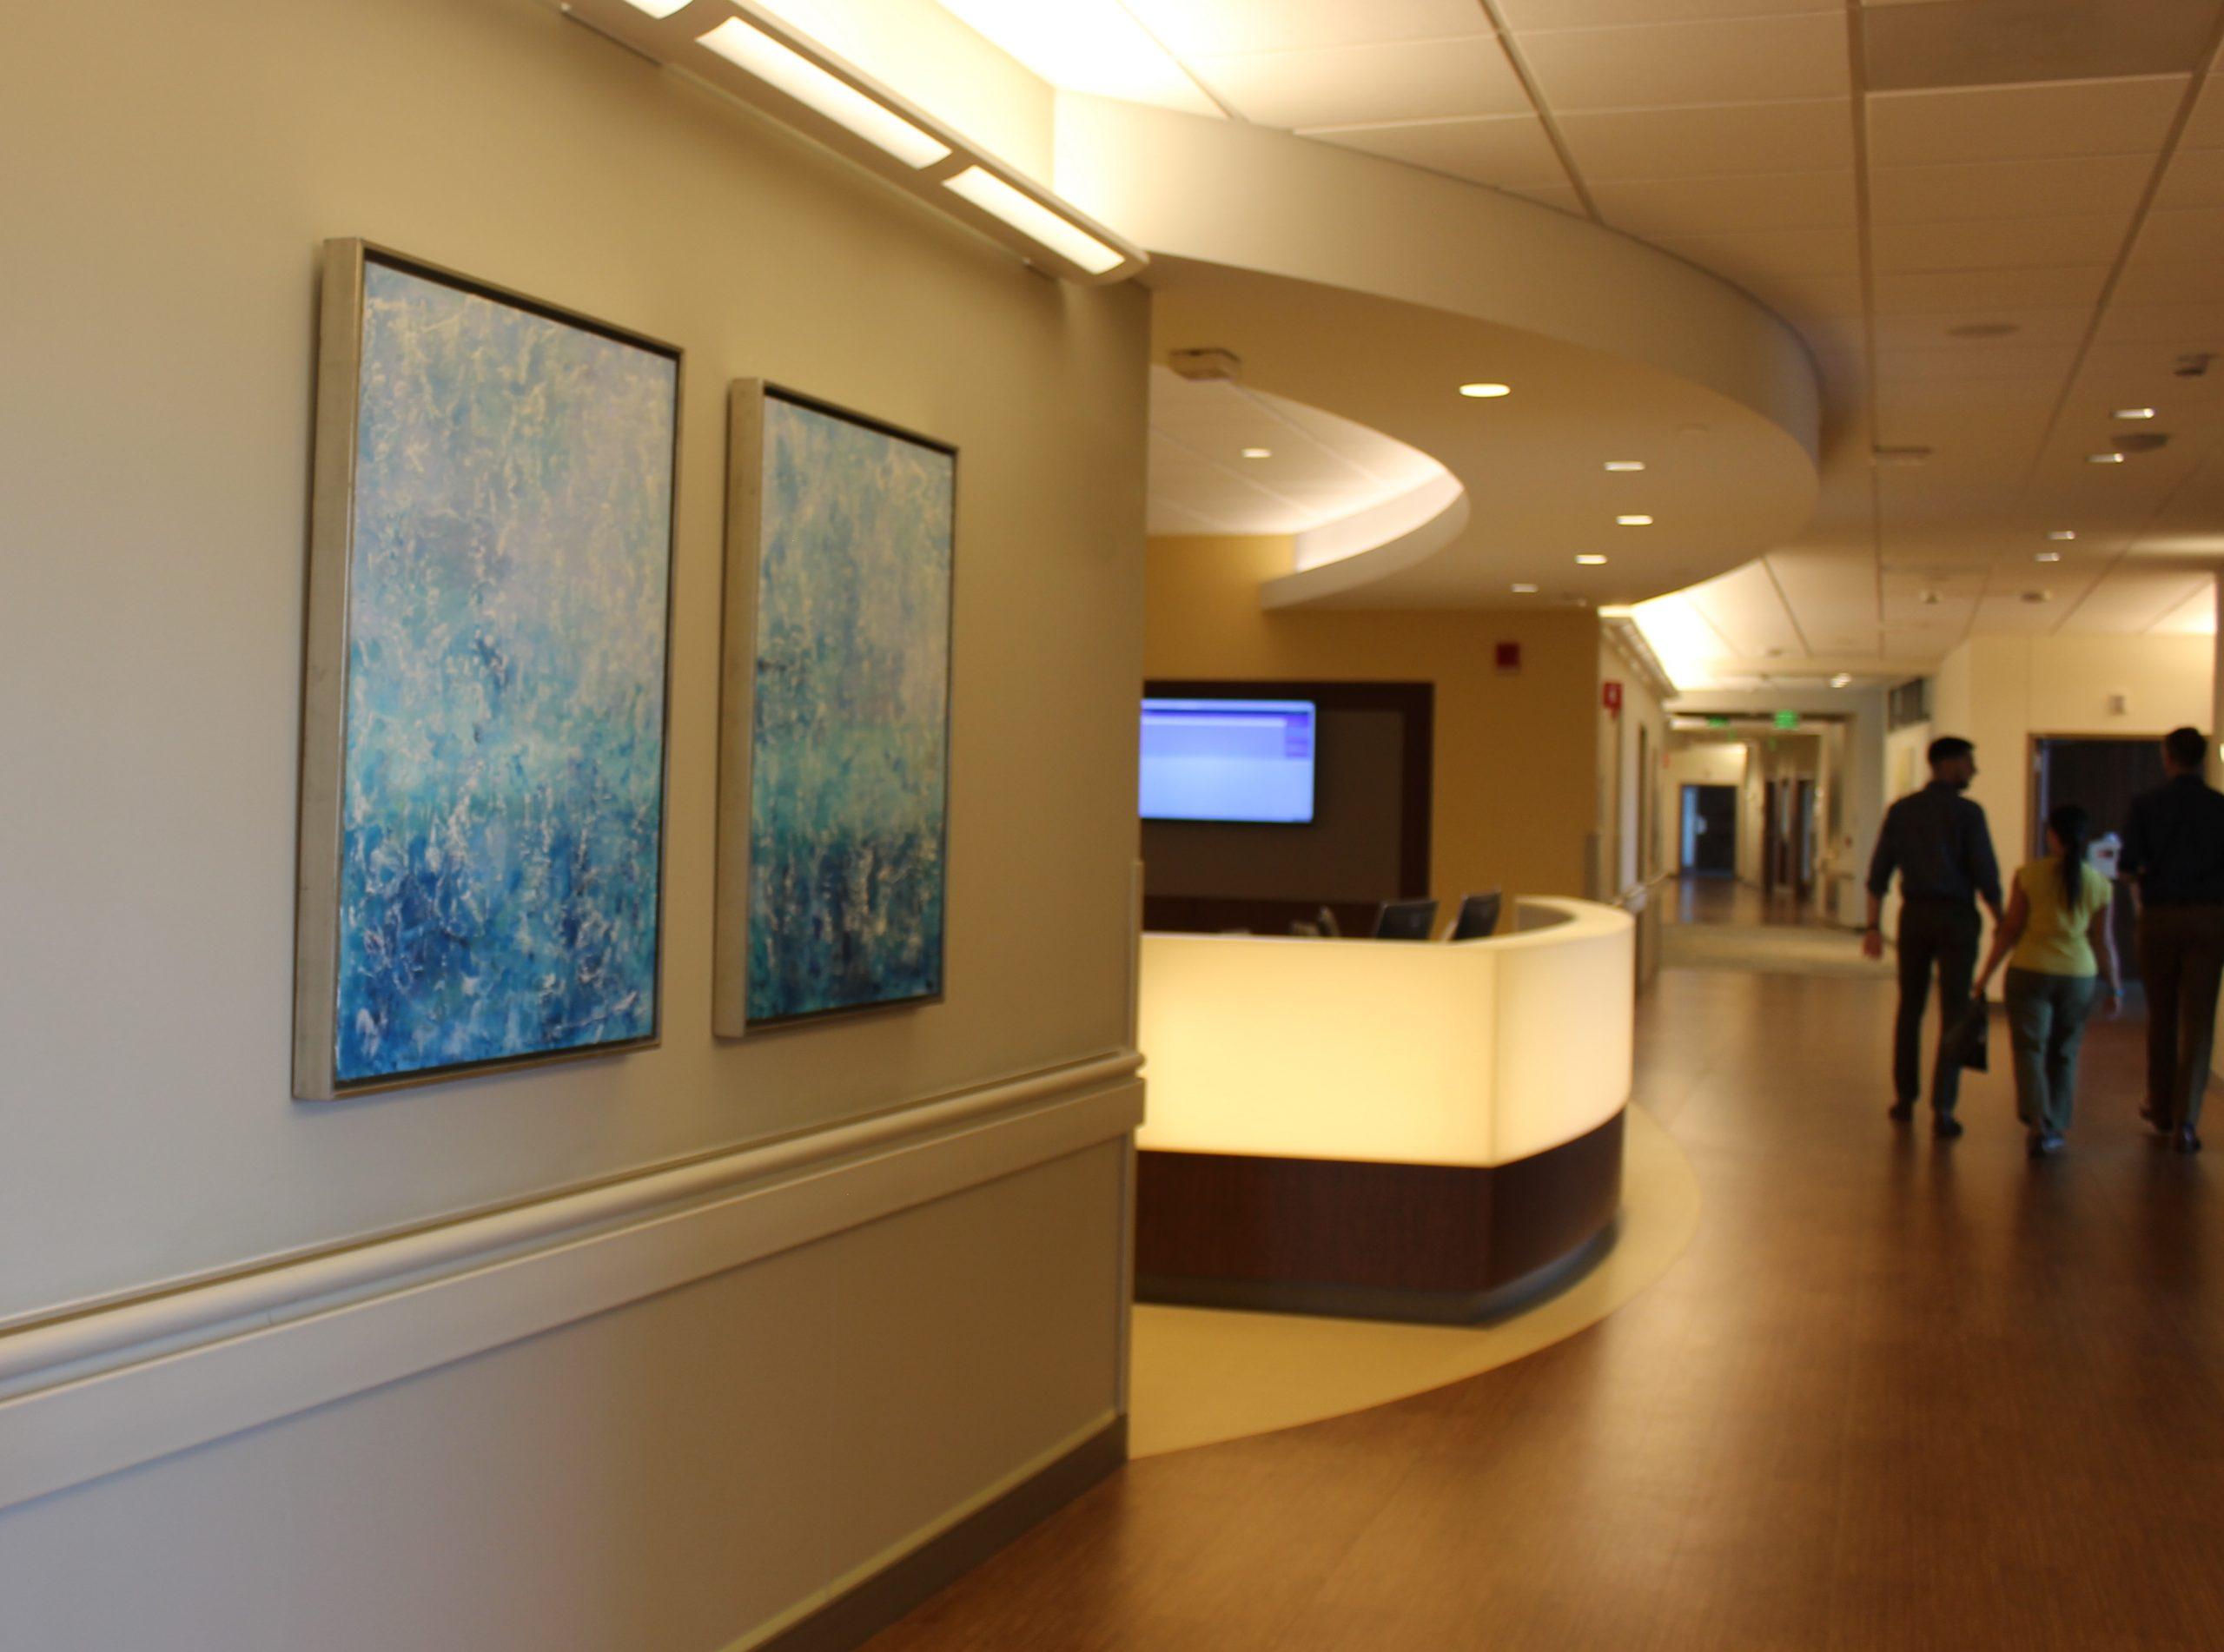 Stamford Hospital, Encaustic and Oil paintings